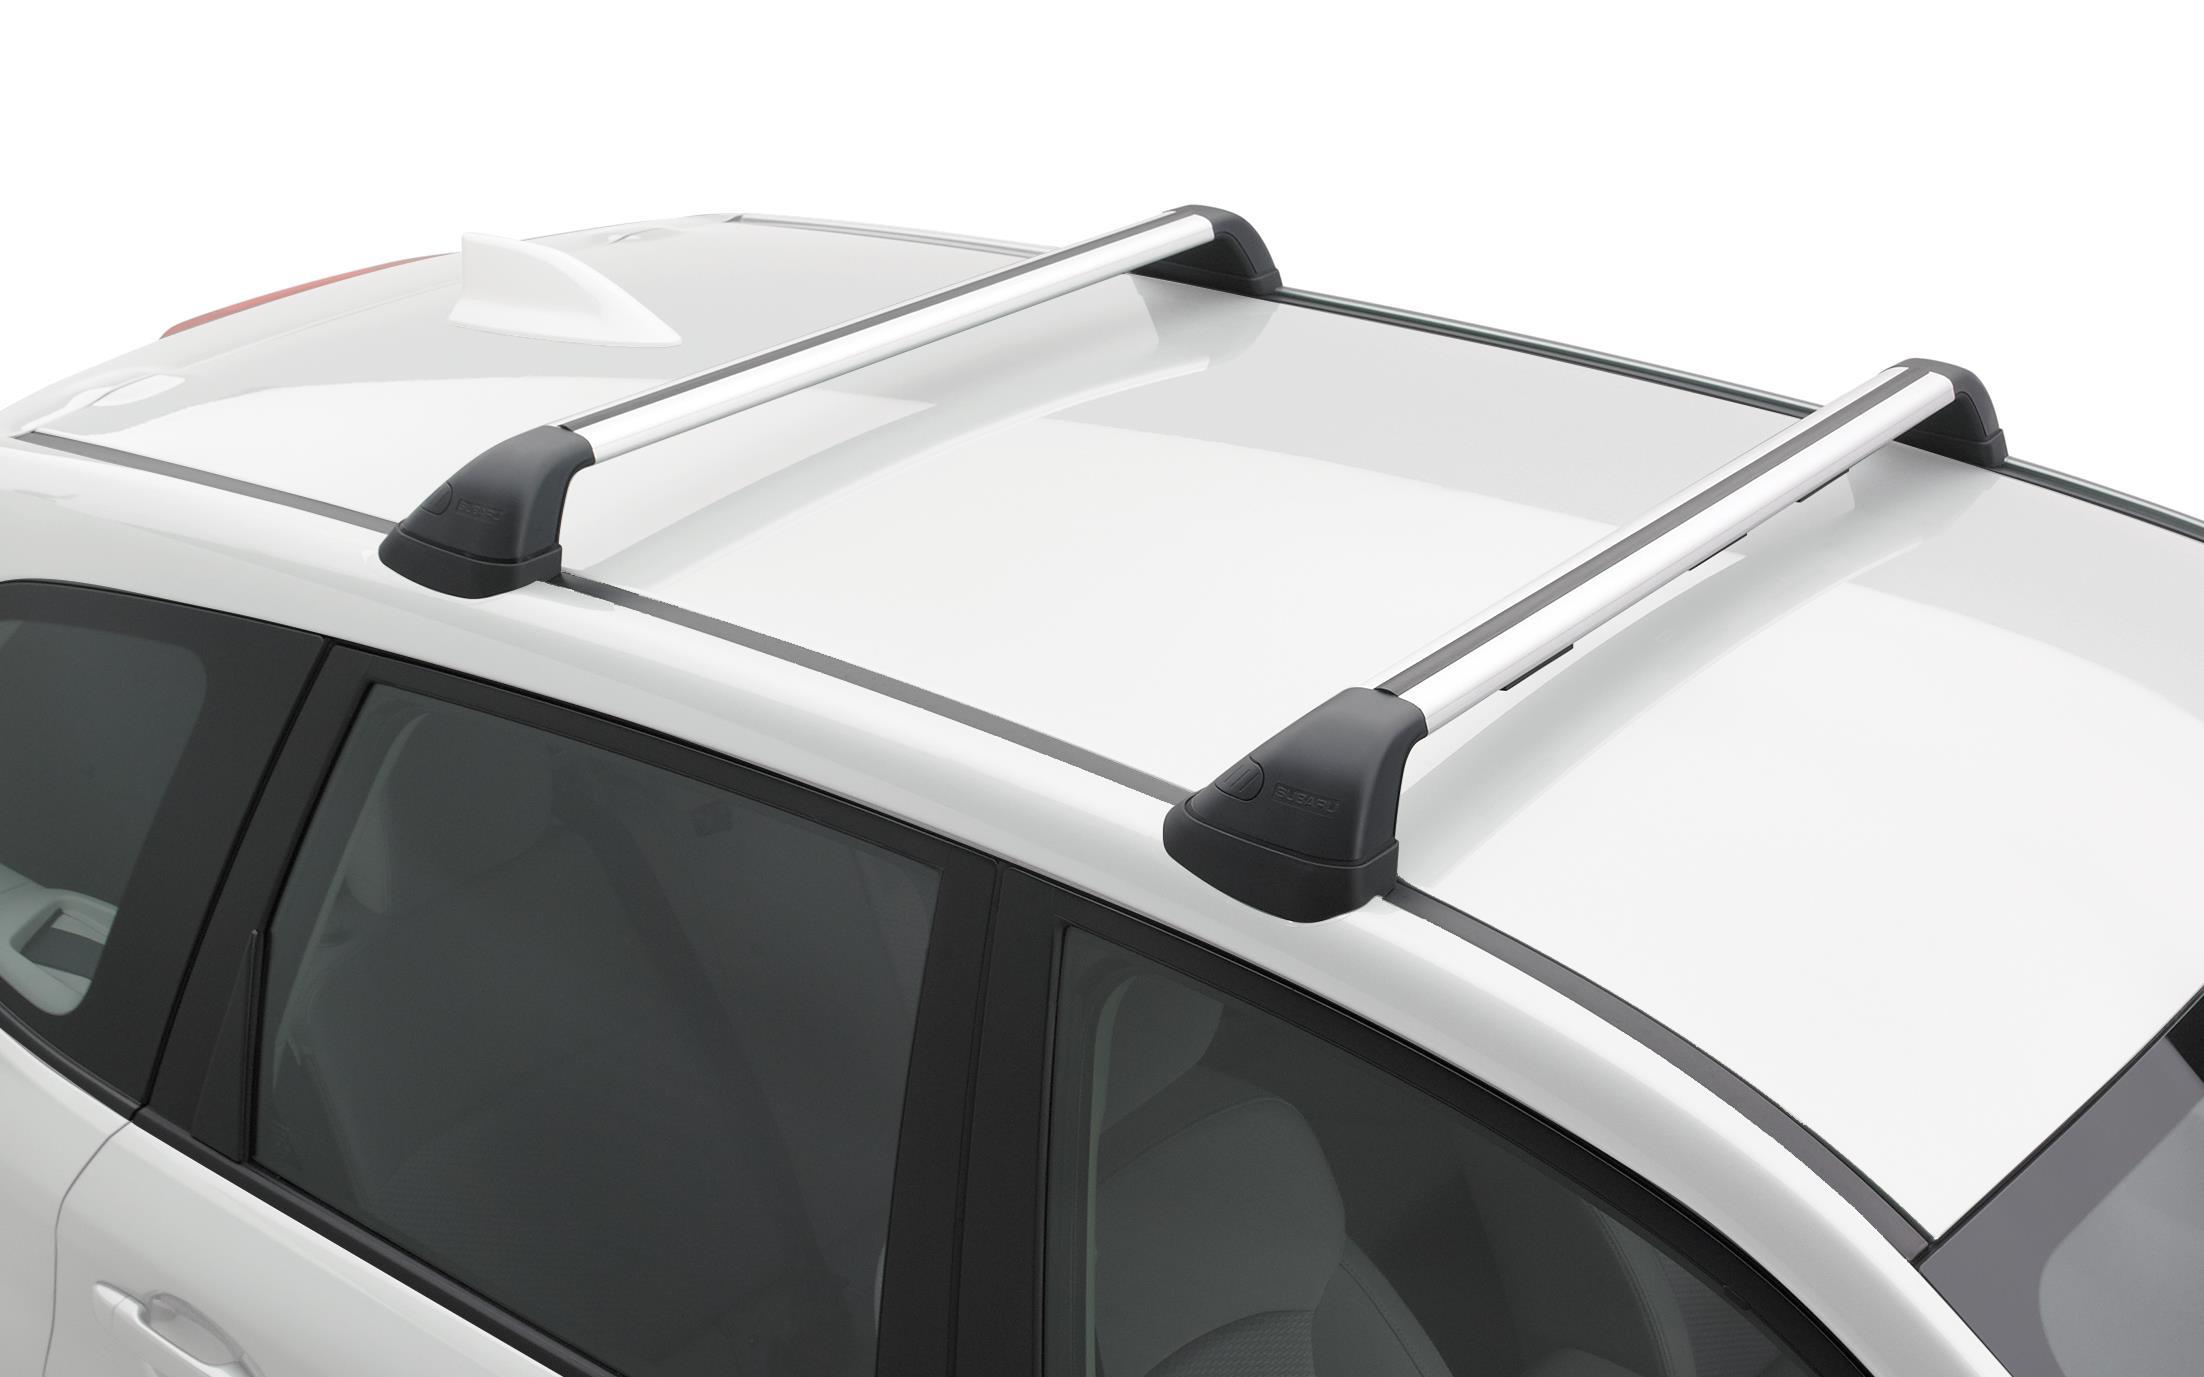 Shop Genuine 2017 Subaru Forester Accessories